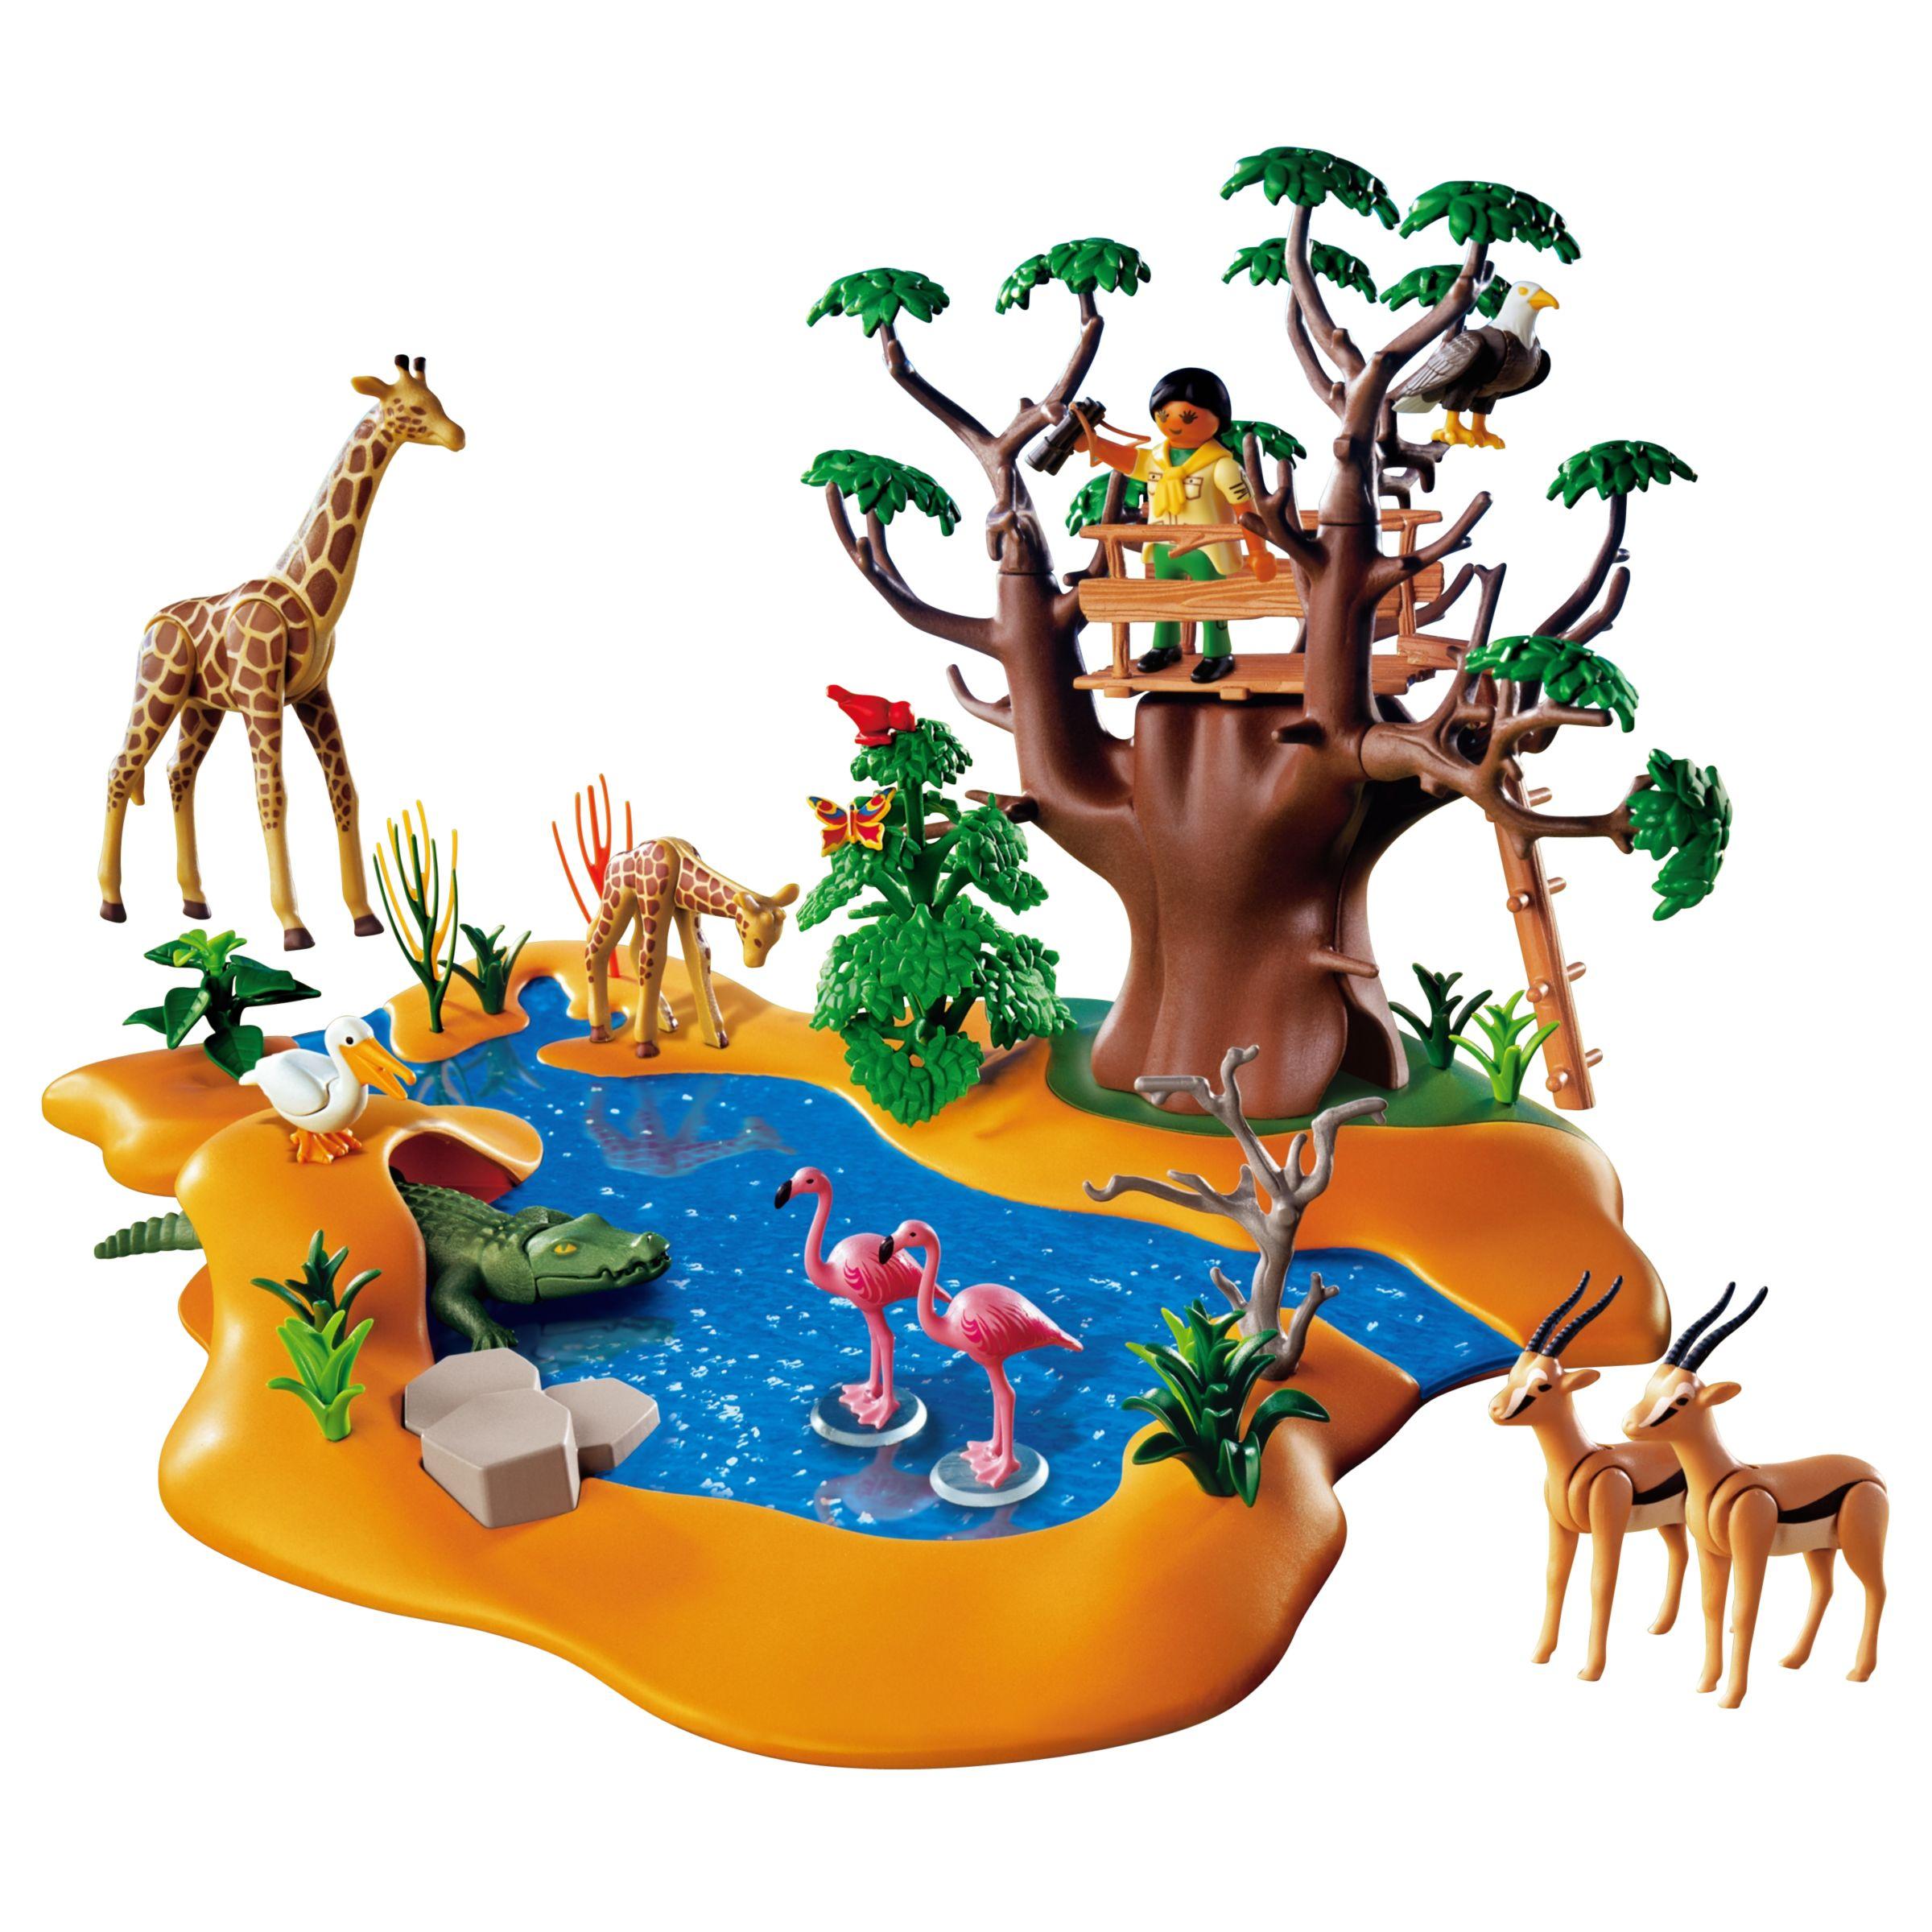 Playmobil Wild Life Waterhole